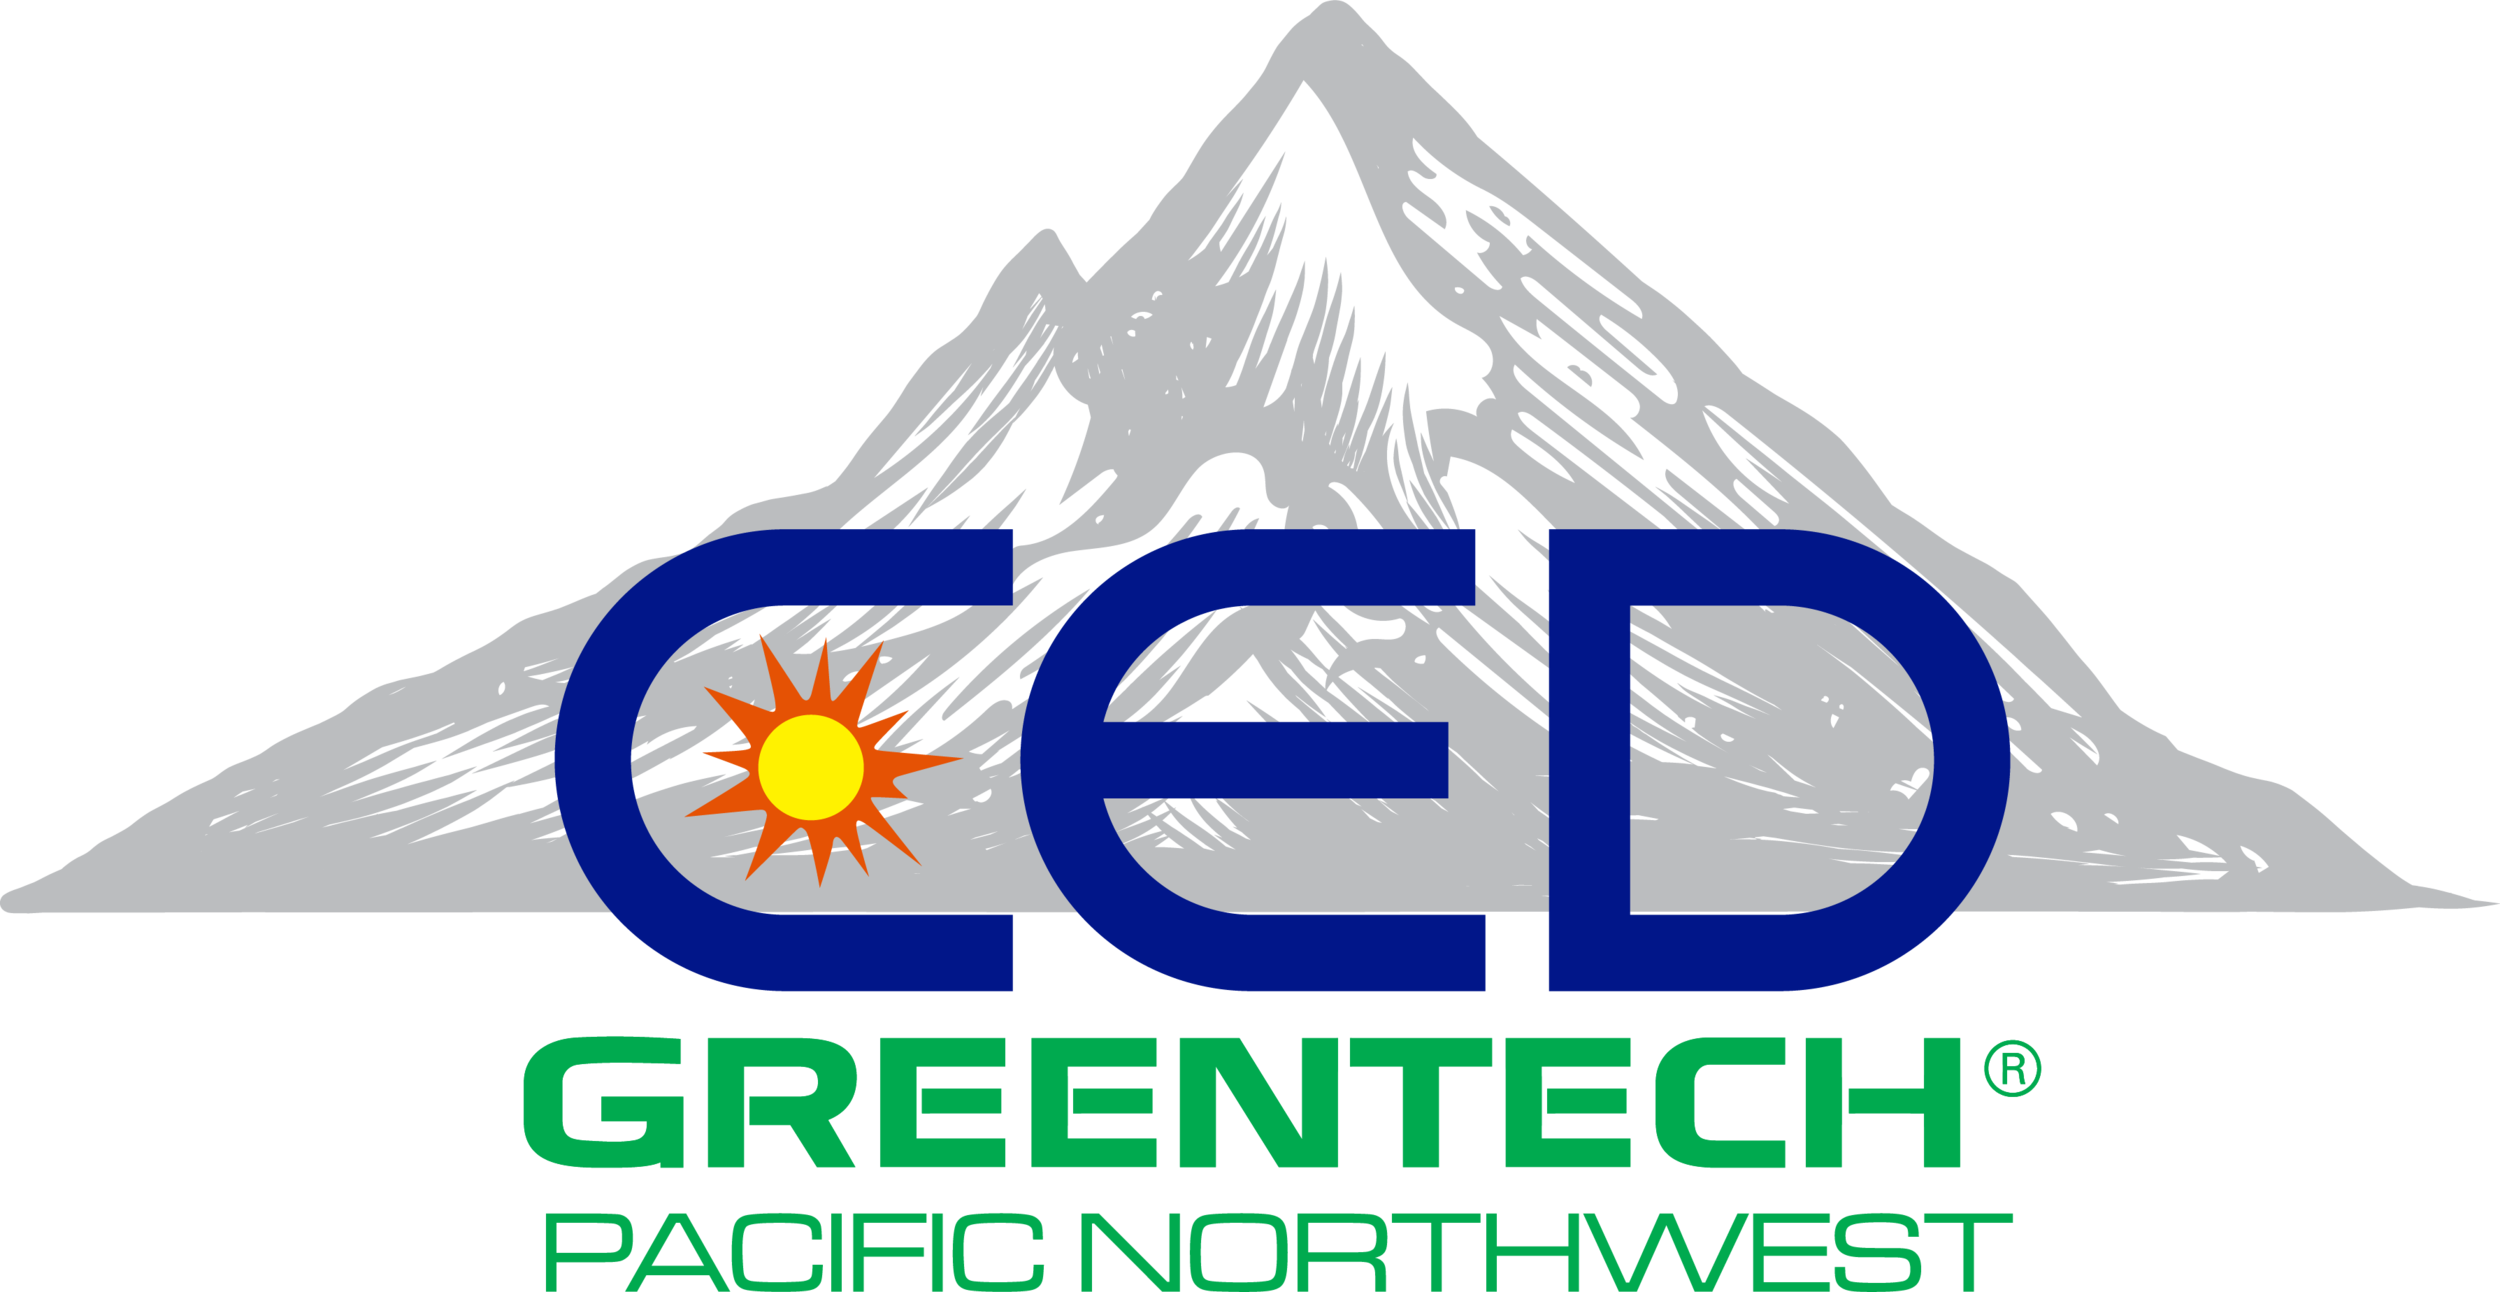 CED Greentech Logo PNW.png